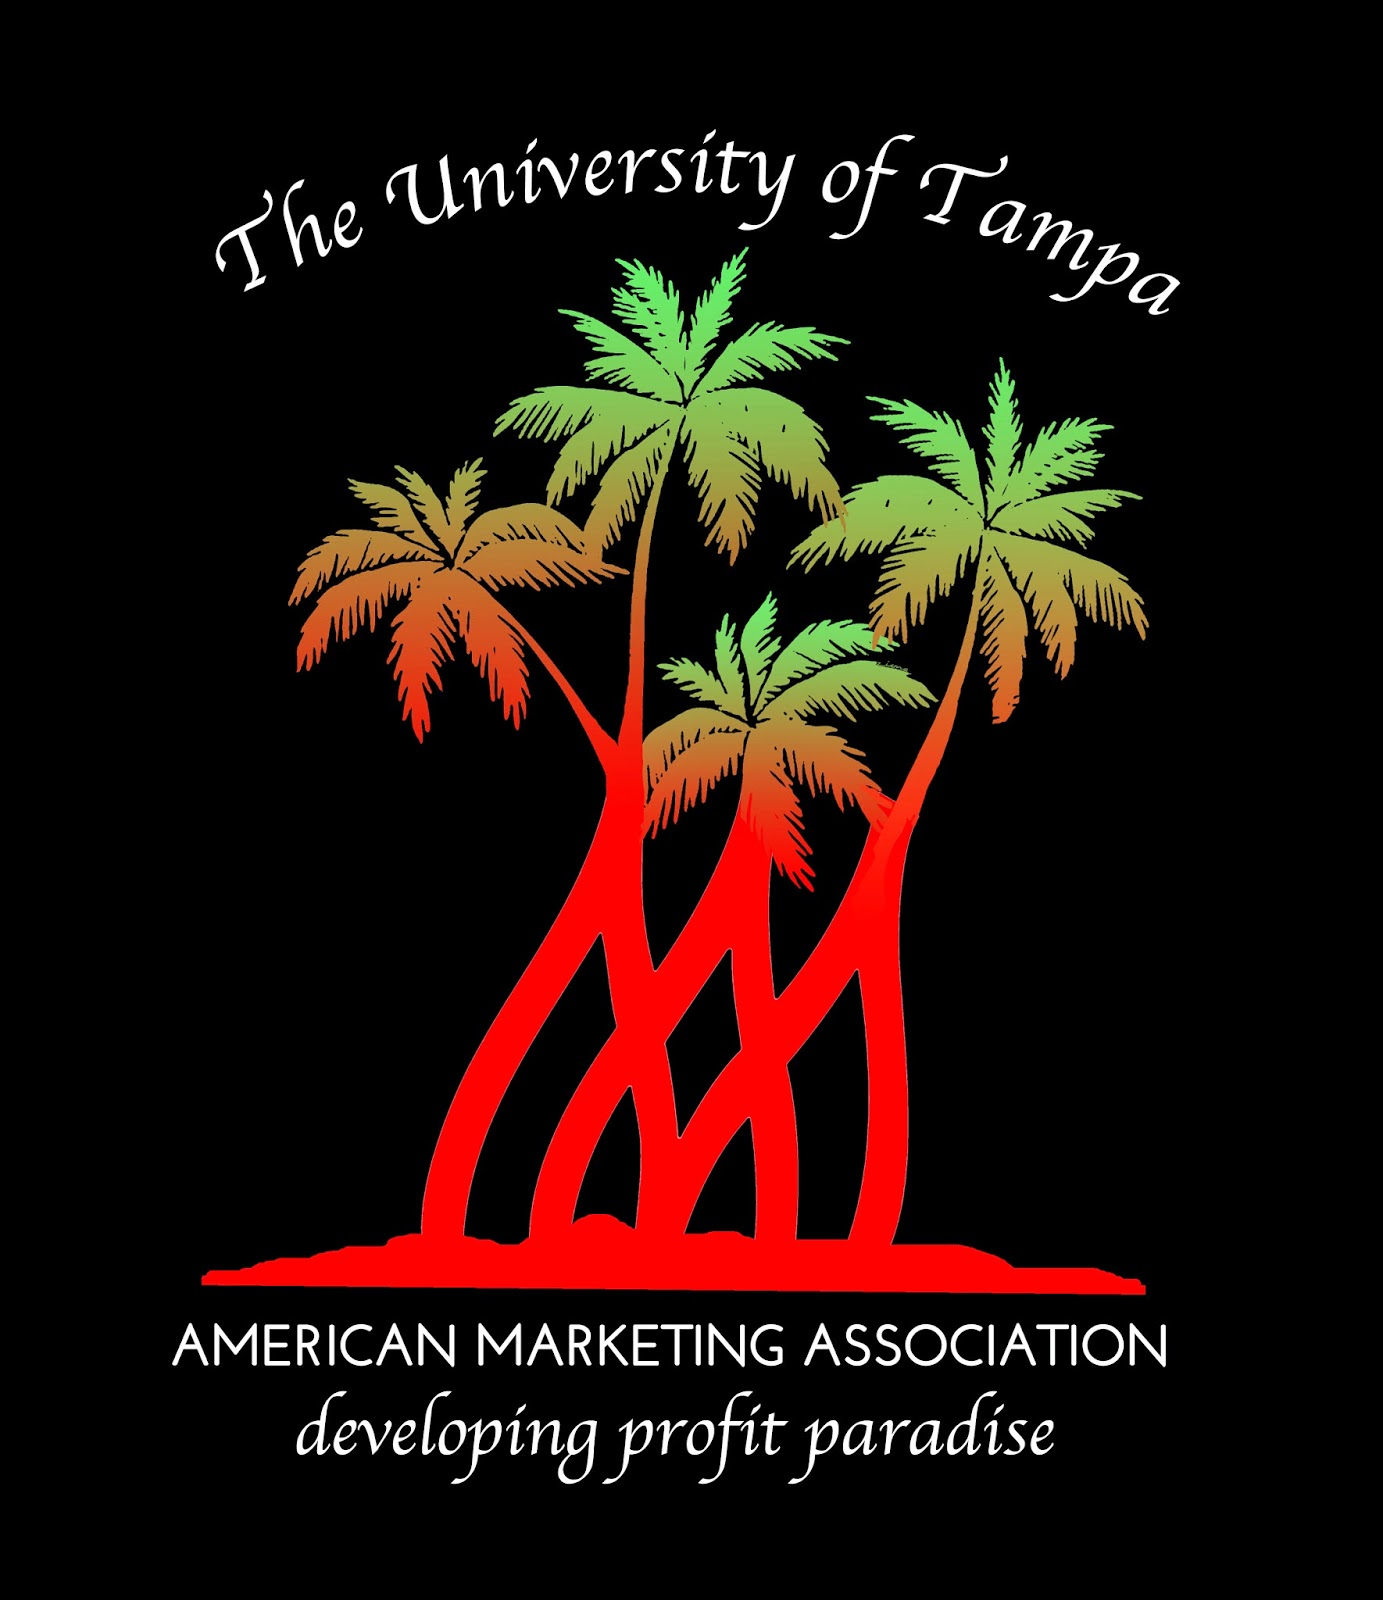 Shirt design tampa - Original Shirt Design Logo For Asian Student Organization Aso The University Of Tampa 1st Place Winner